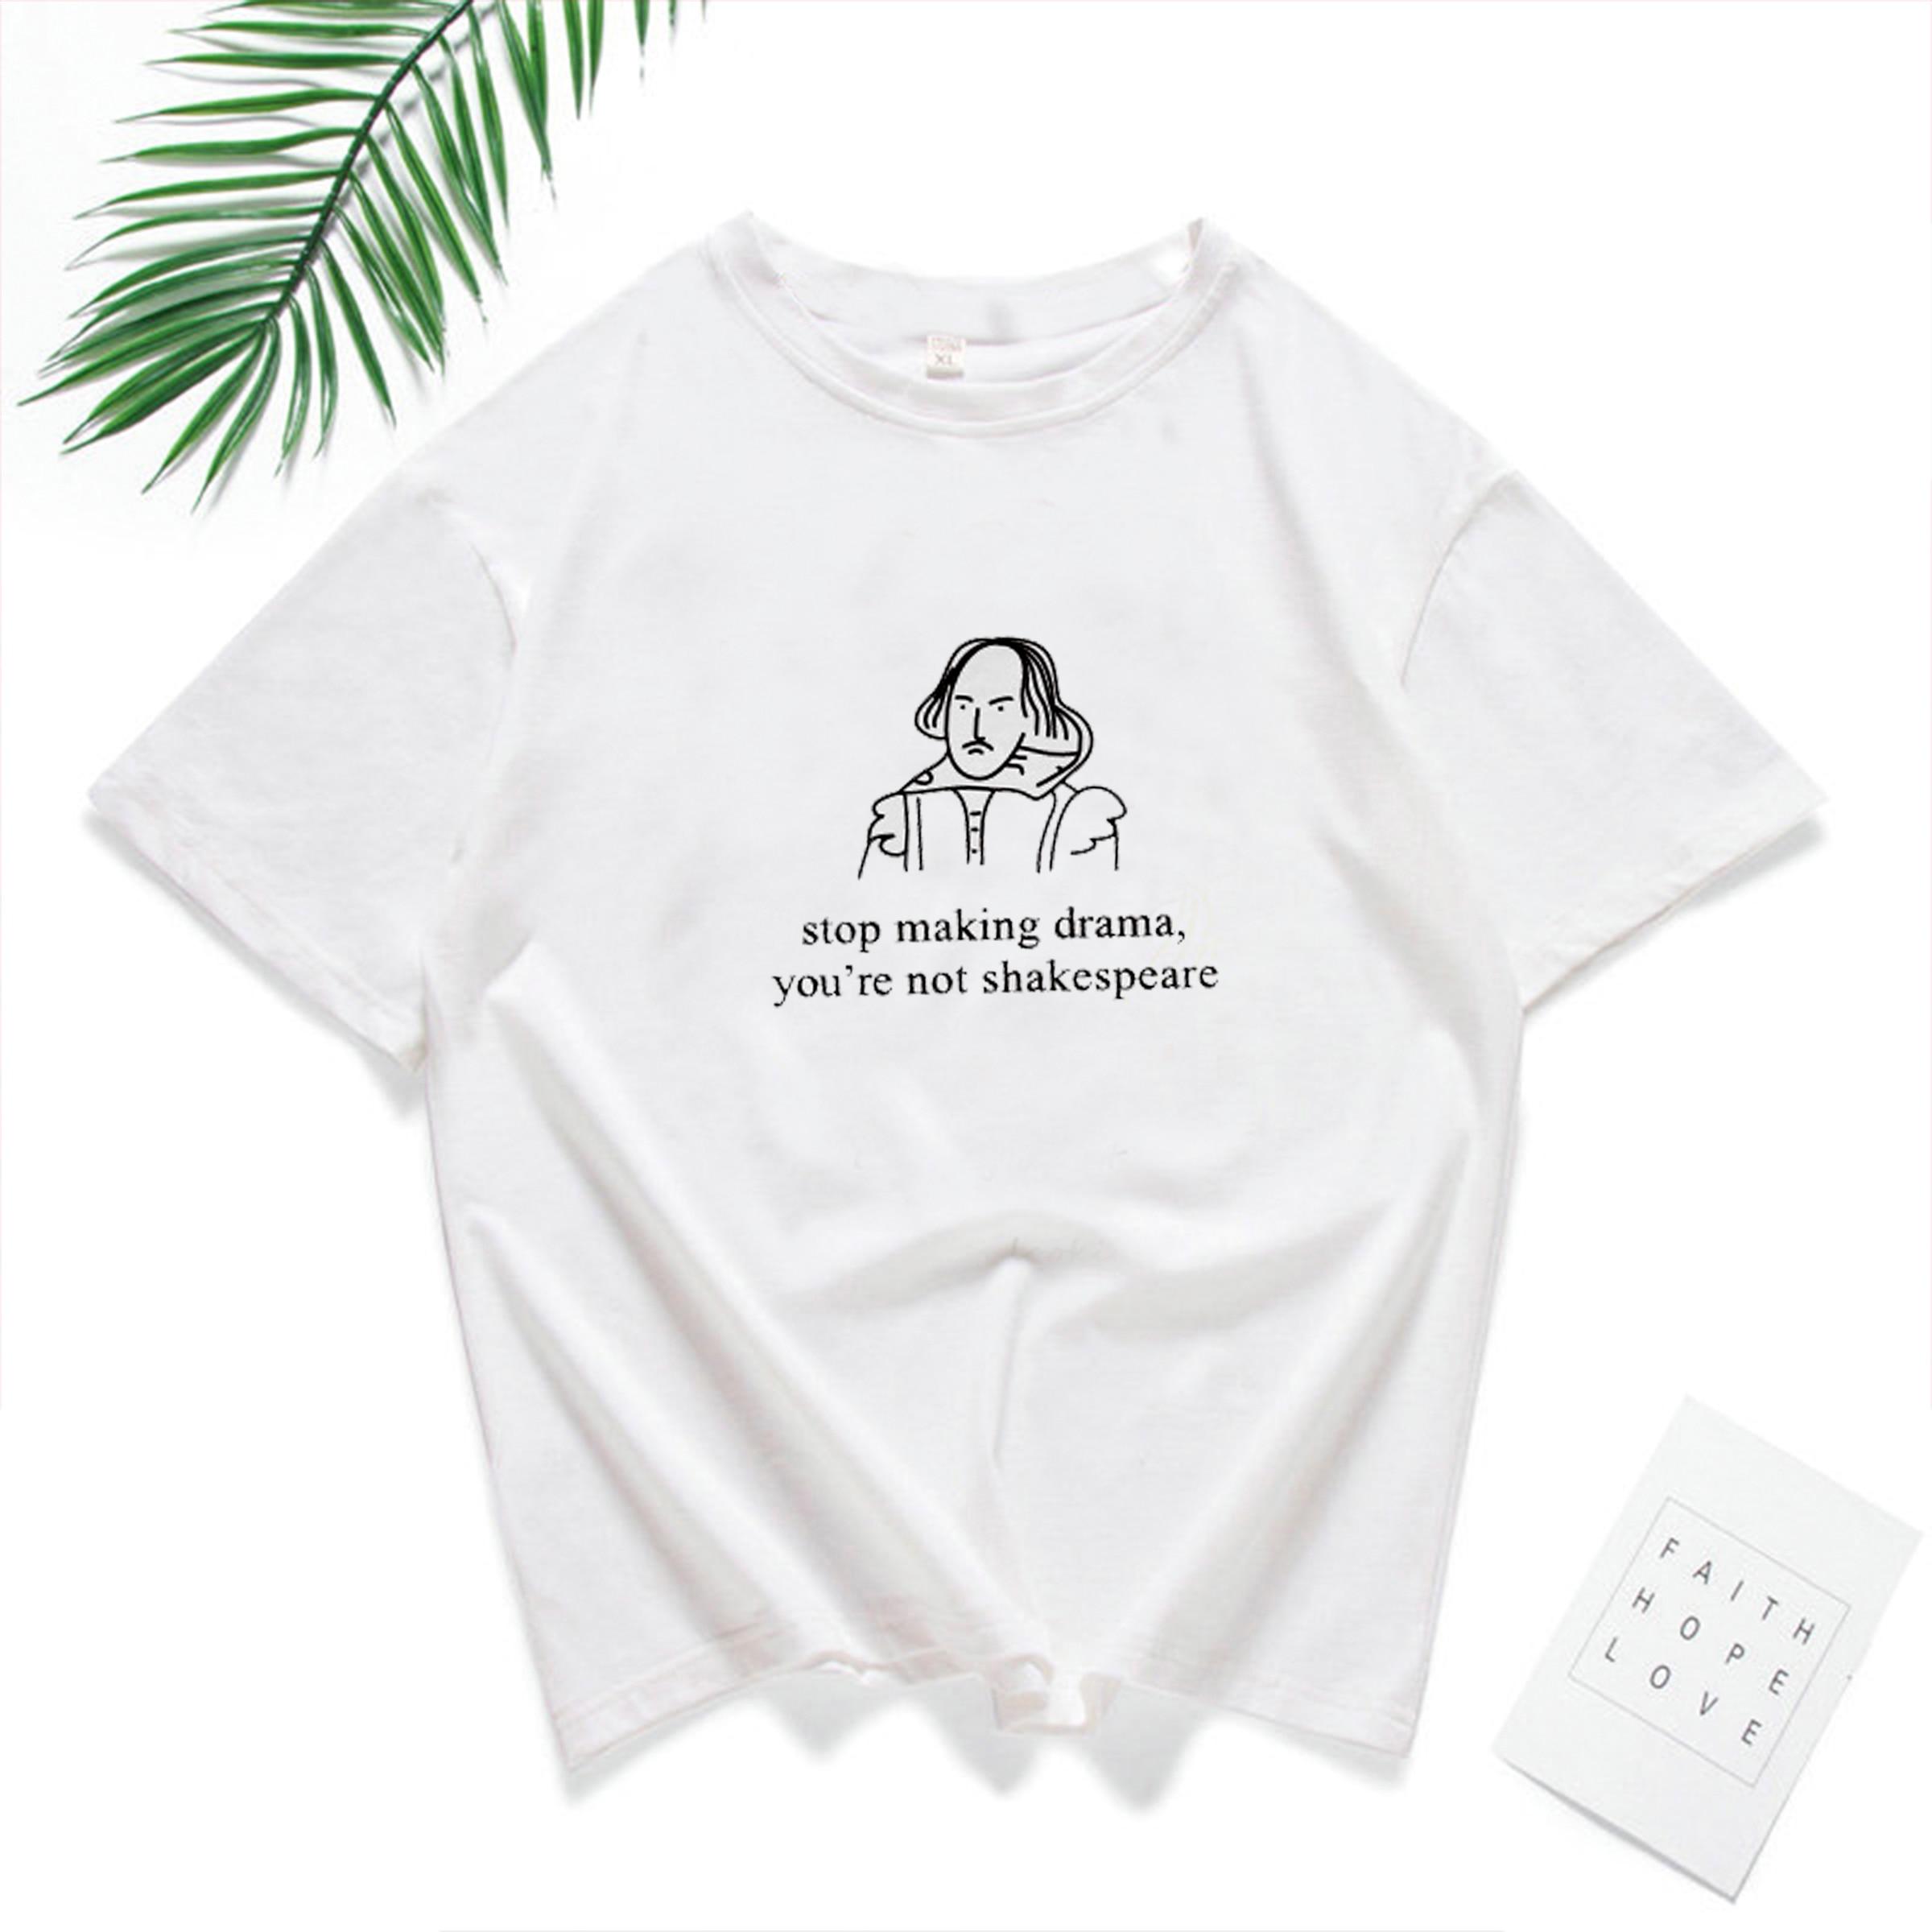 Shakespeare Print Character Letter Top Female Summer T-Shirt Women 2019 Casual White T Shirt Short Sleeve Harajuku Tee Shirt